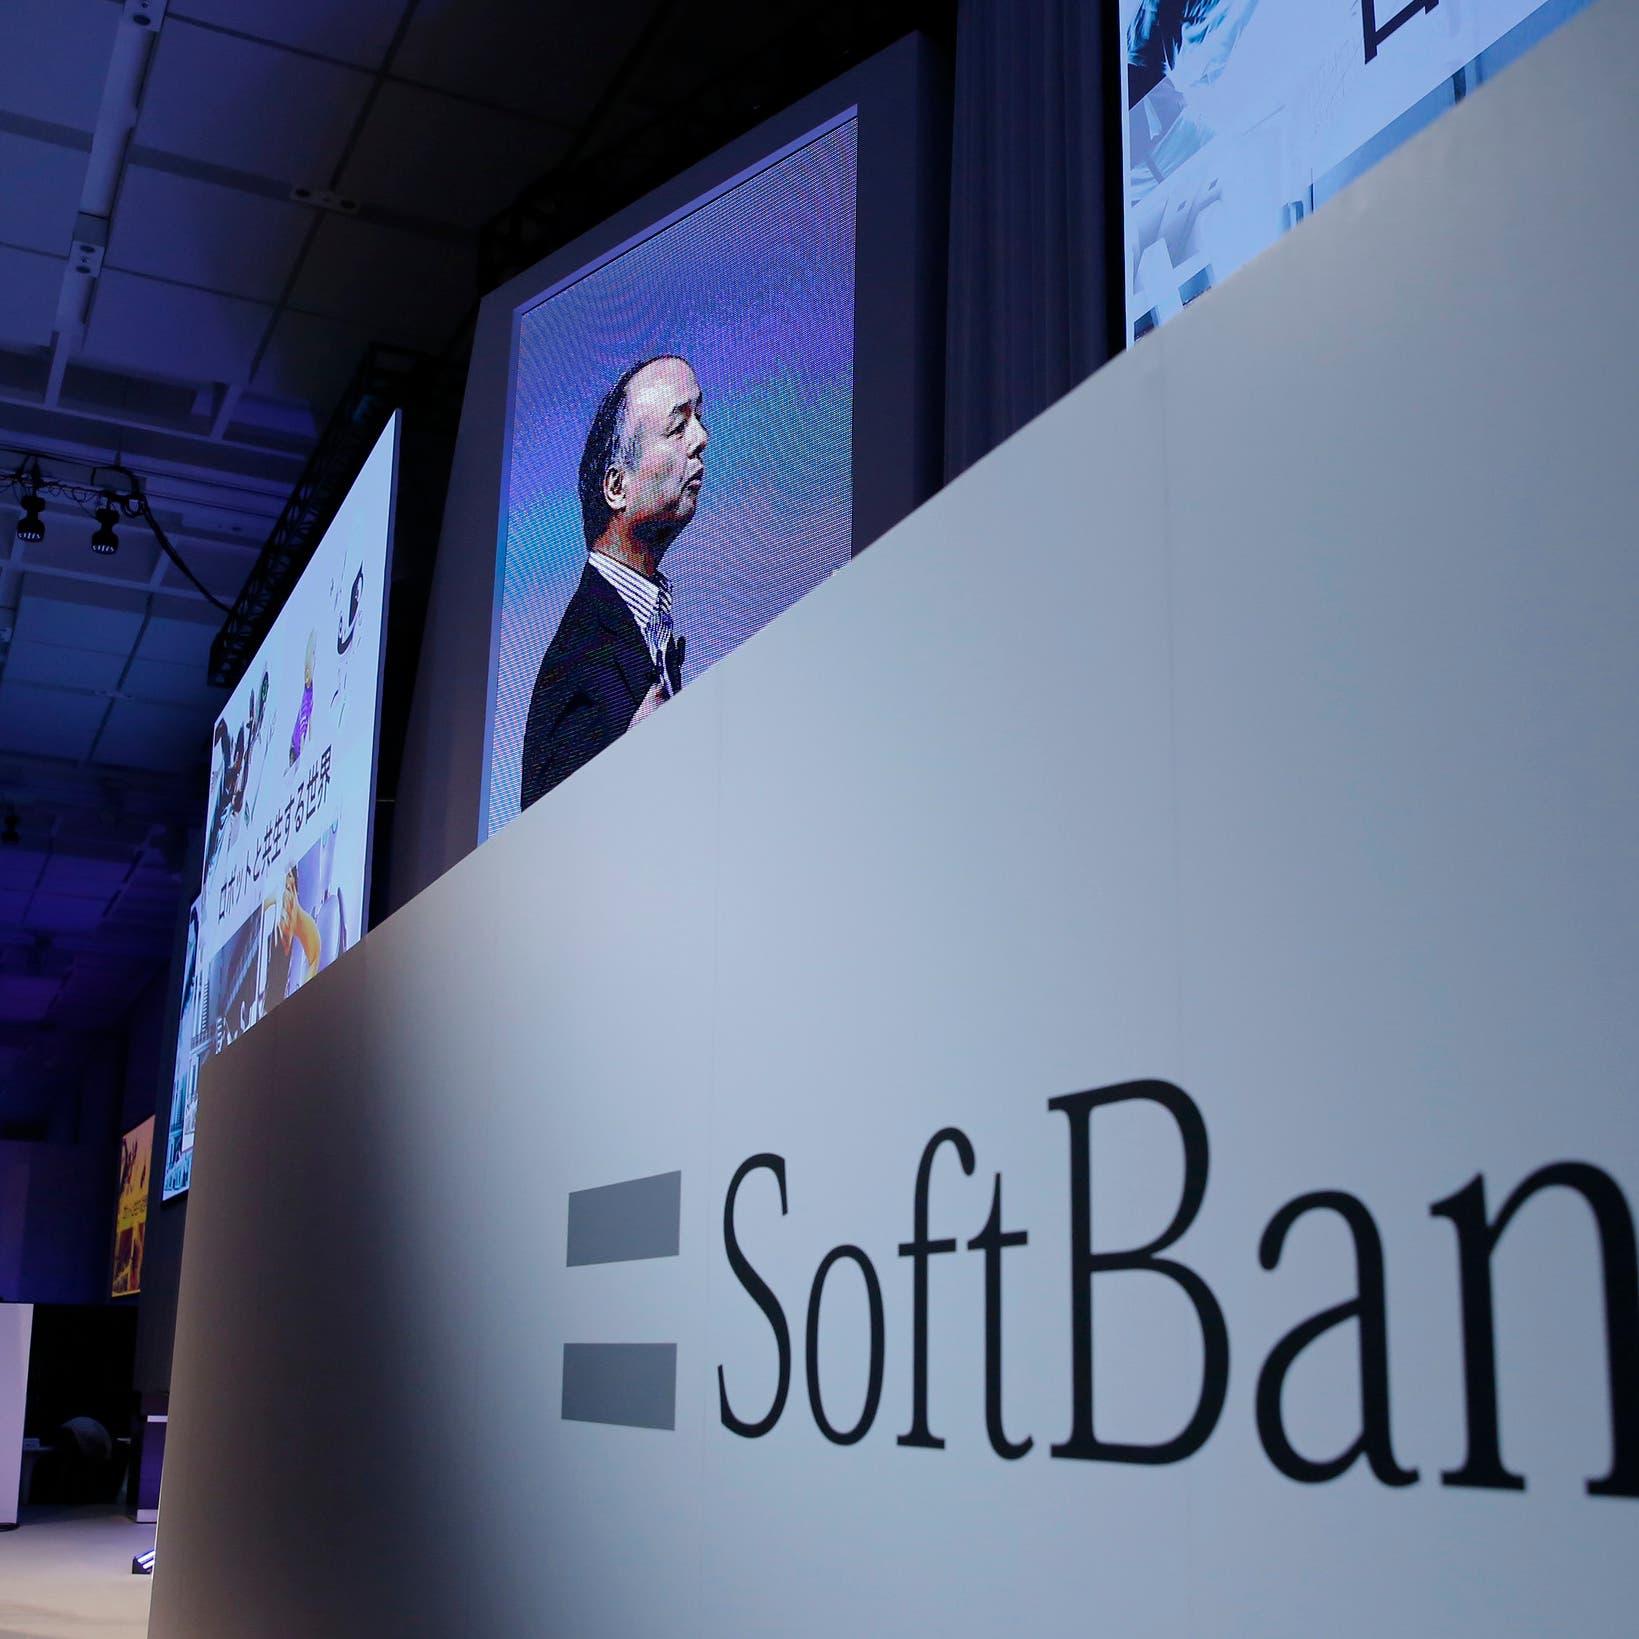 فايننشال تايمز: سوفت بنك ستستثمر مليار دولار في وي ورك